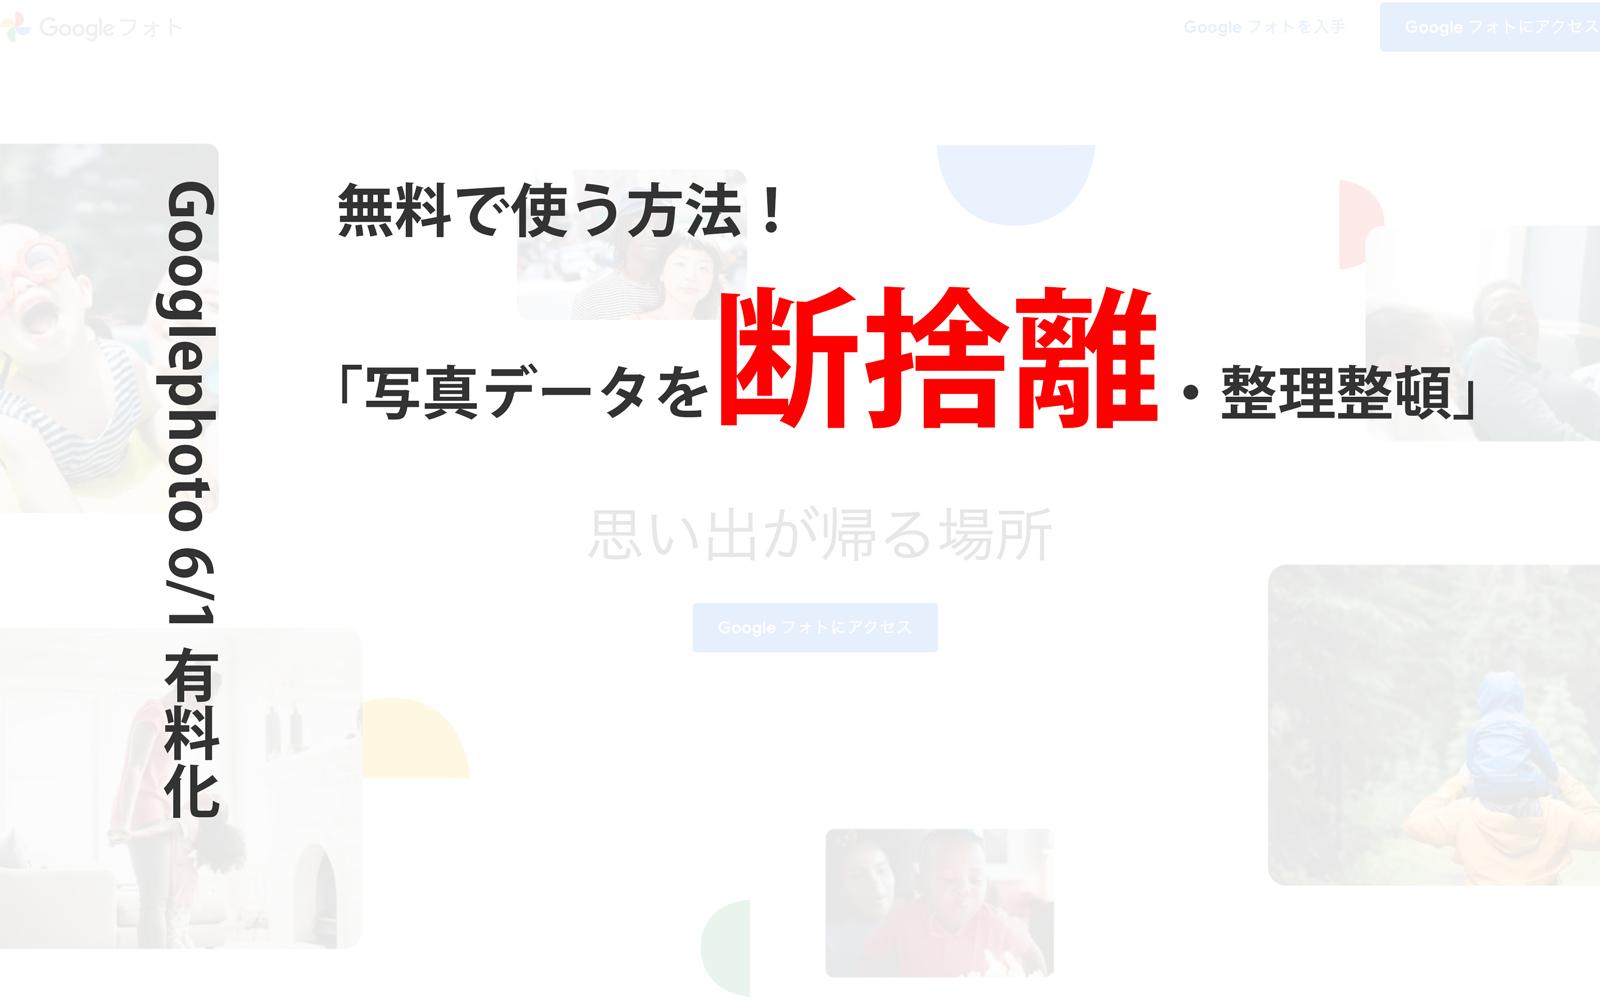 Googleフォト 6/1 有料化でも無料のまま使う方法!「写真データを断捨離・整理整頓」